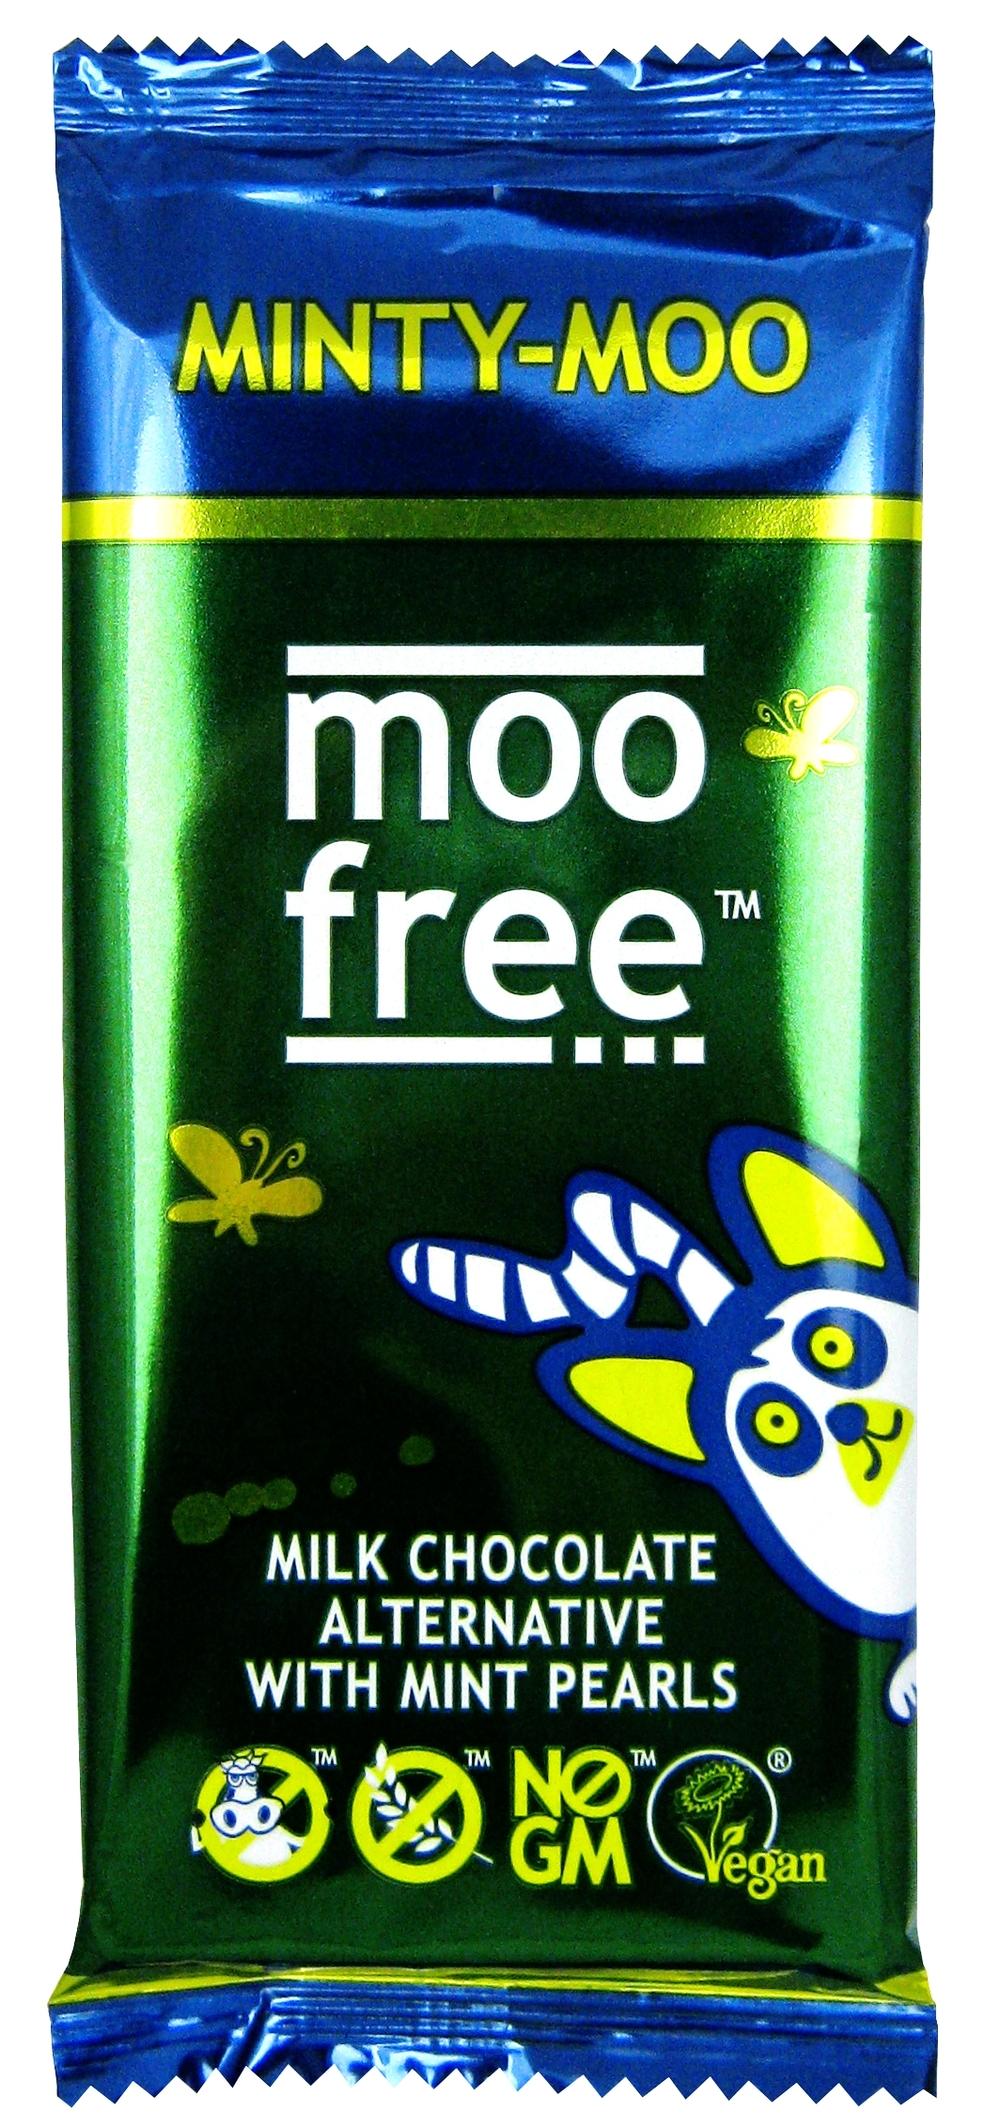 moo-free-minty-moo-large-bar-hi-res.jpg